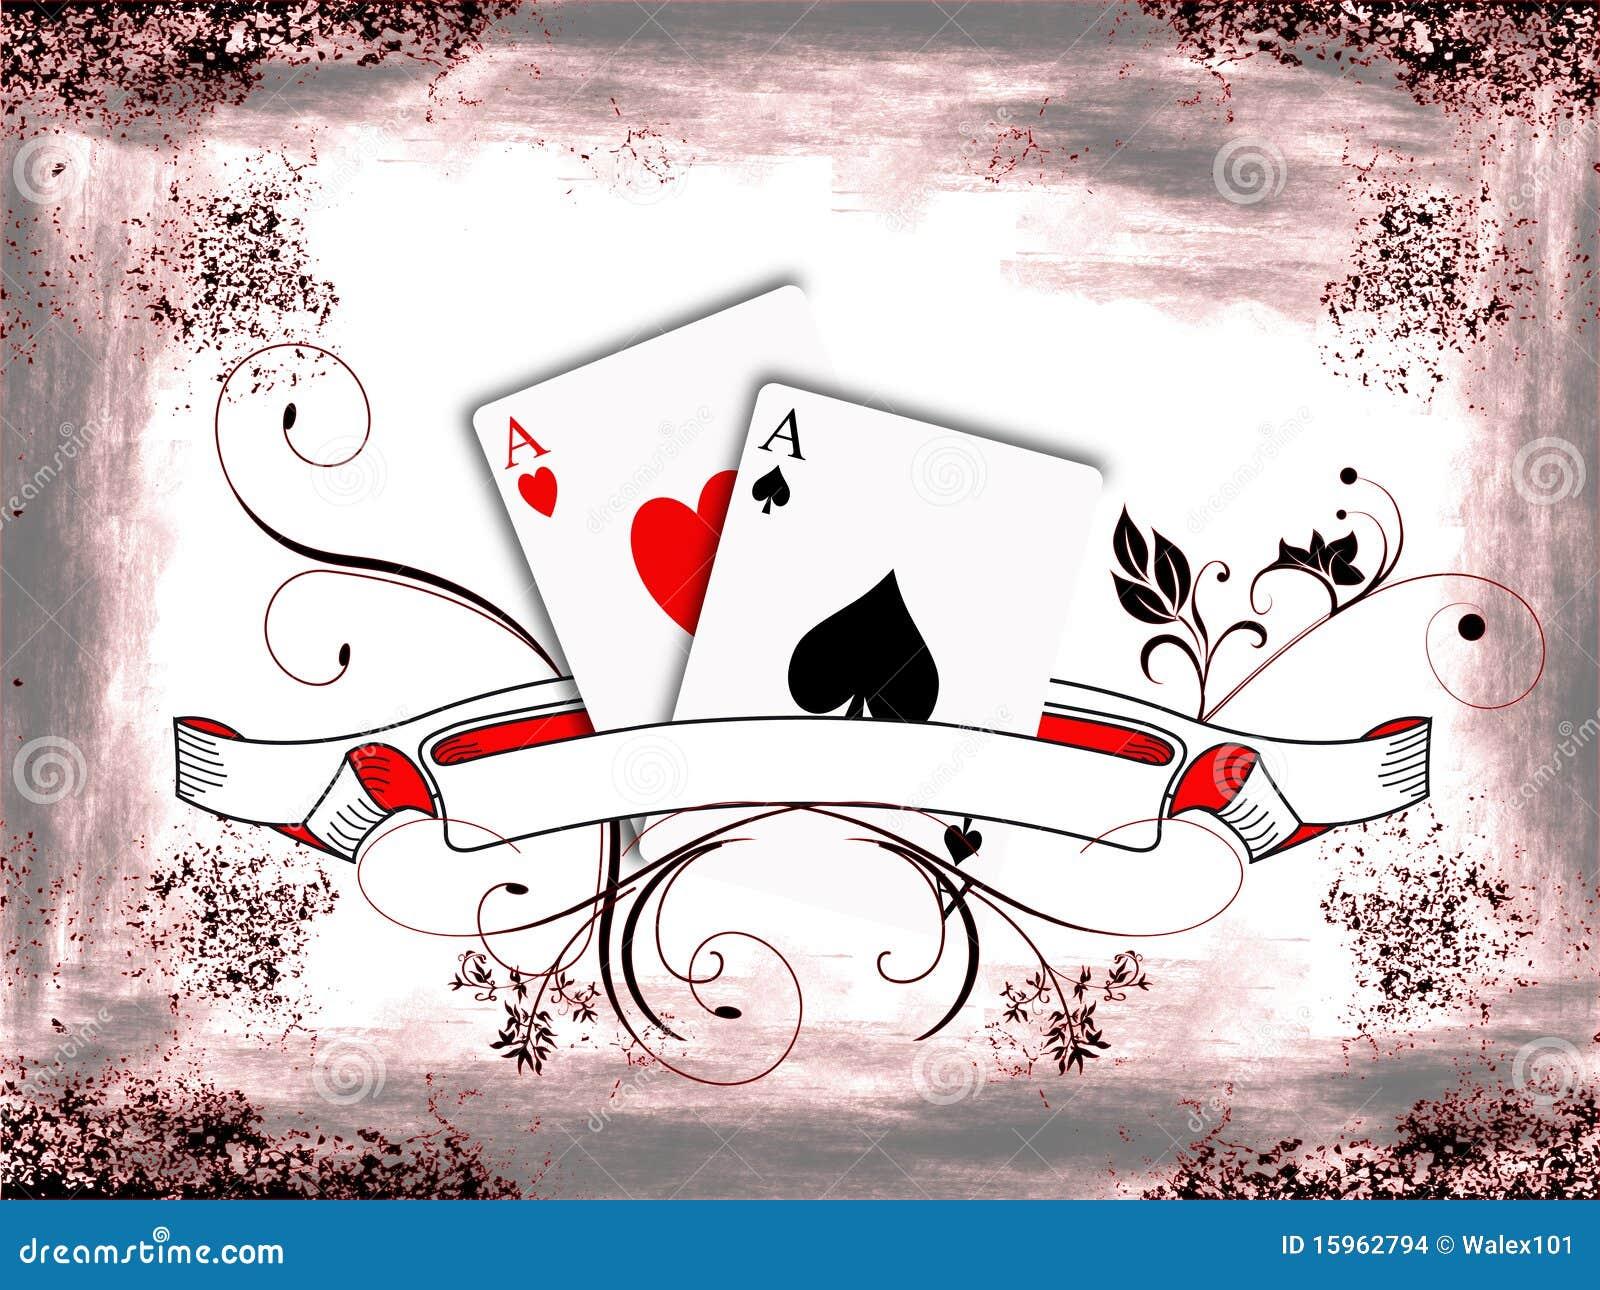 Texas Hold'em Poker Stock Images - Image: 15962794